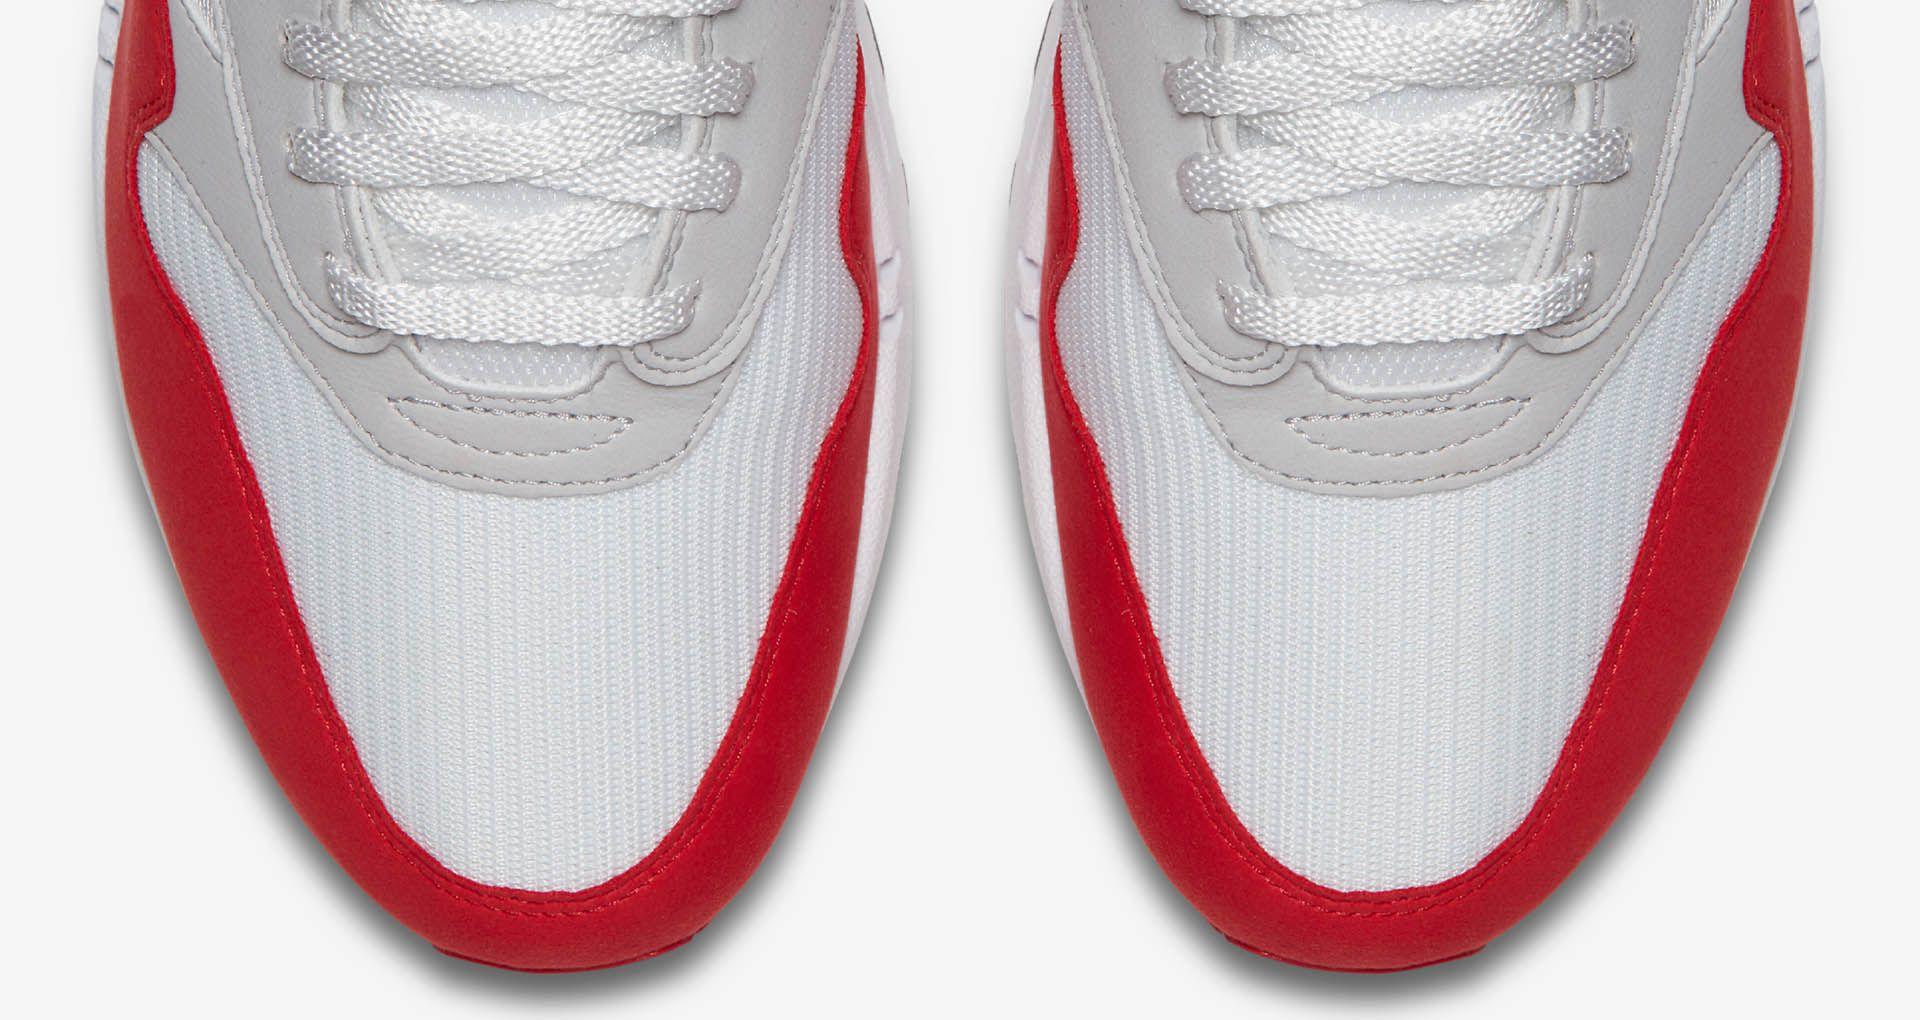 Nike Air Max 1 Anniversary 'White & University Red'. Nike SNKRS